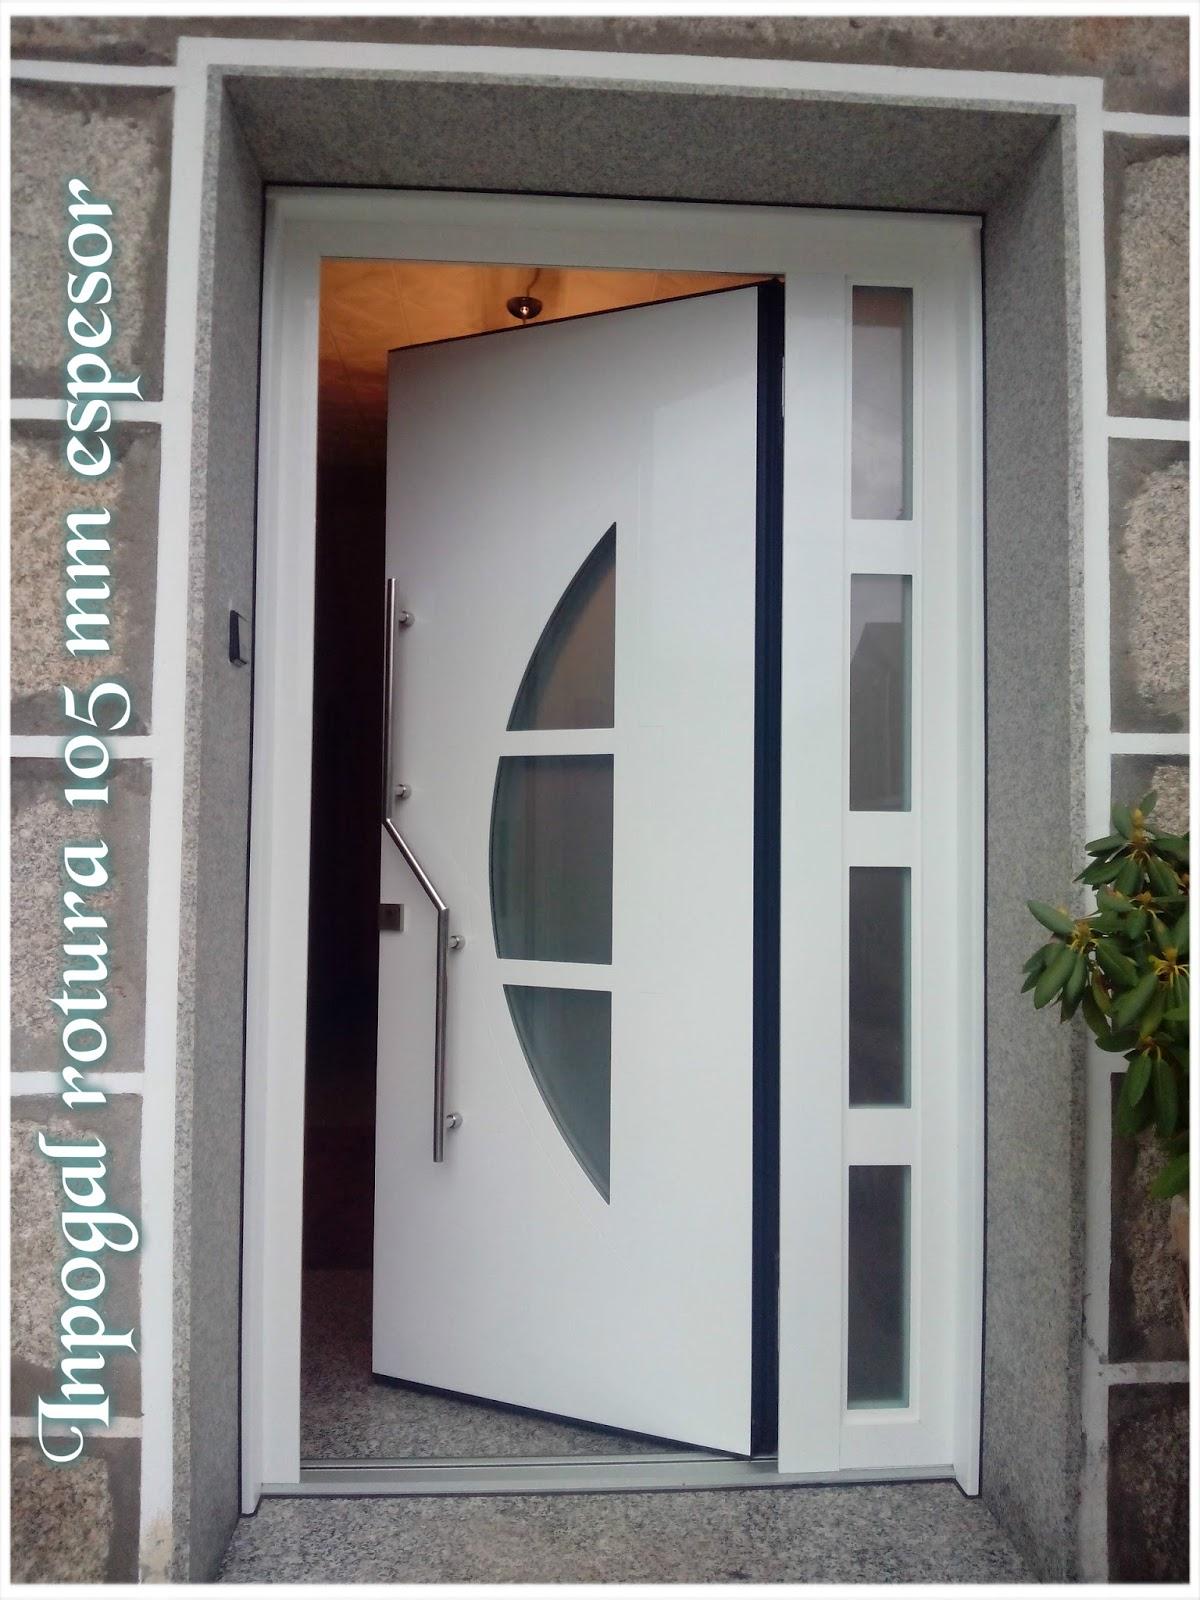 Puertas aluminio inpogal puertas de rotura serie prestige - Puertas de exteriores ...